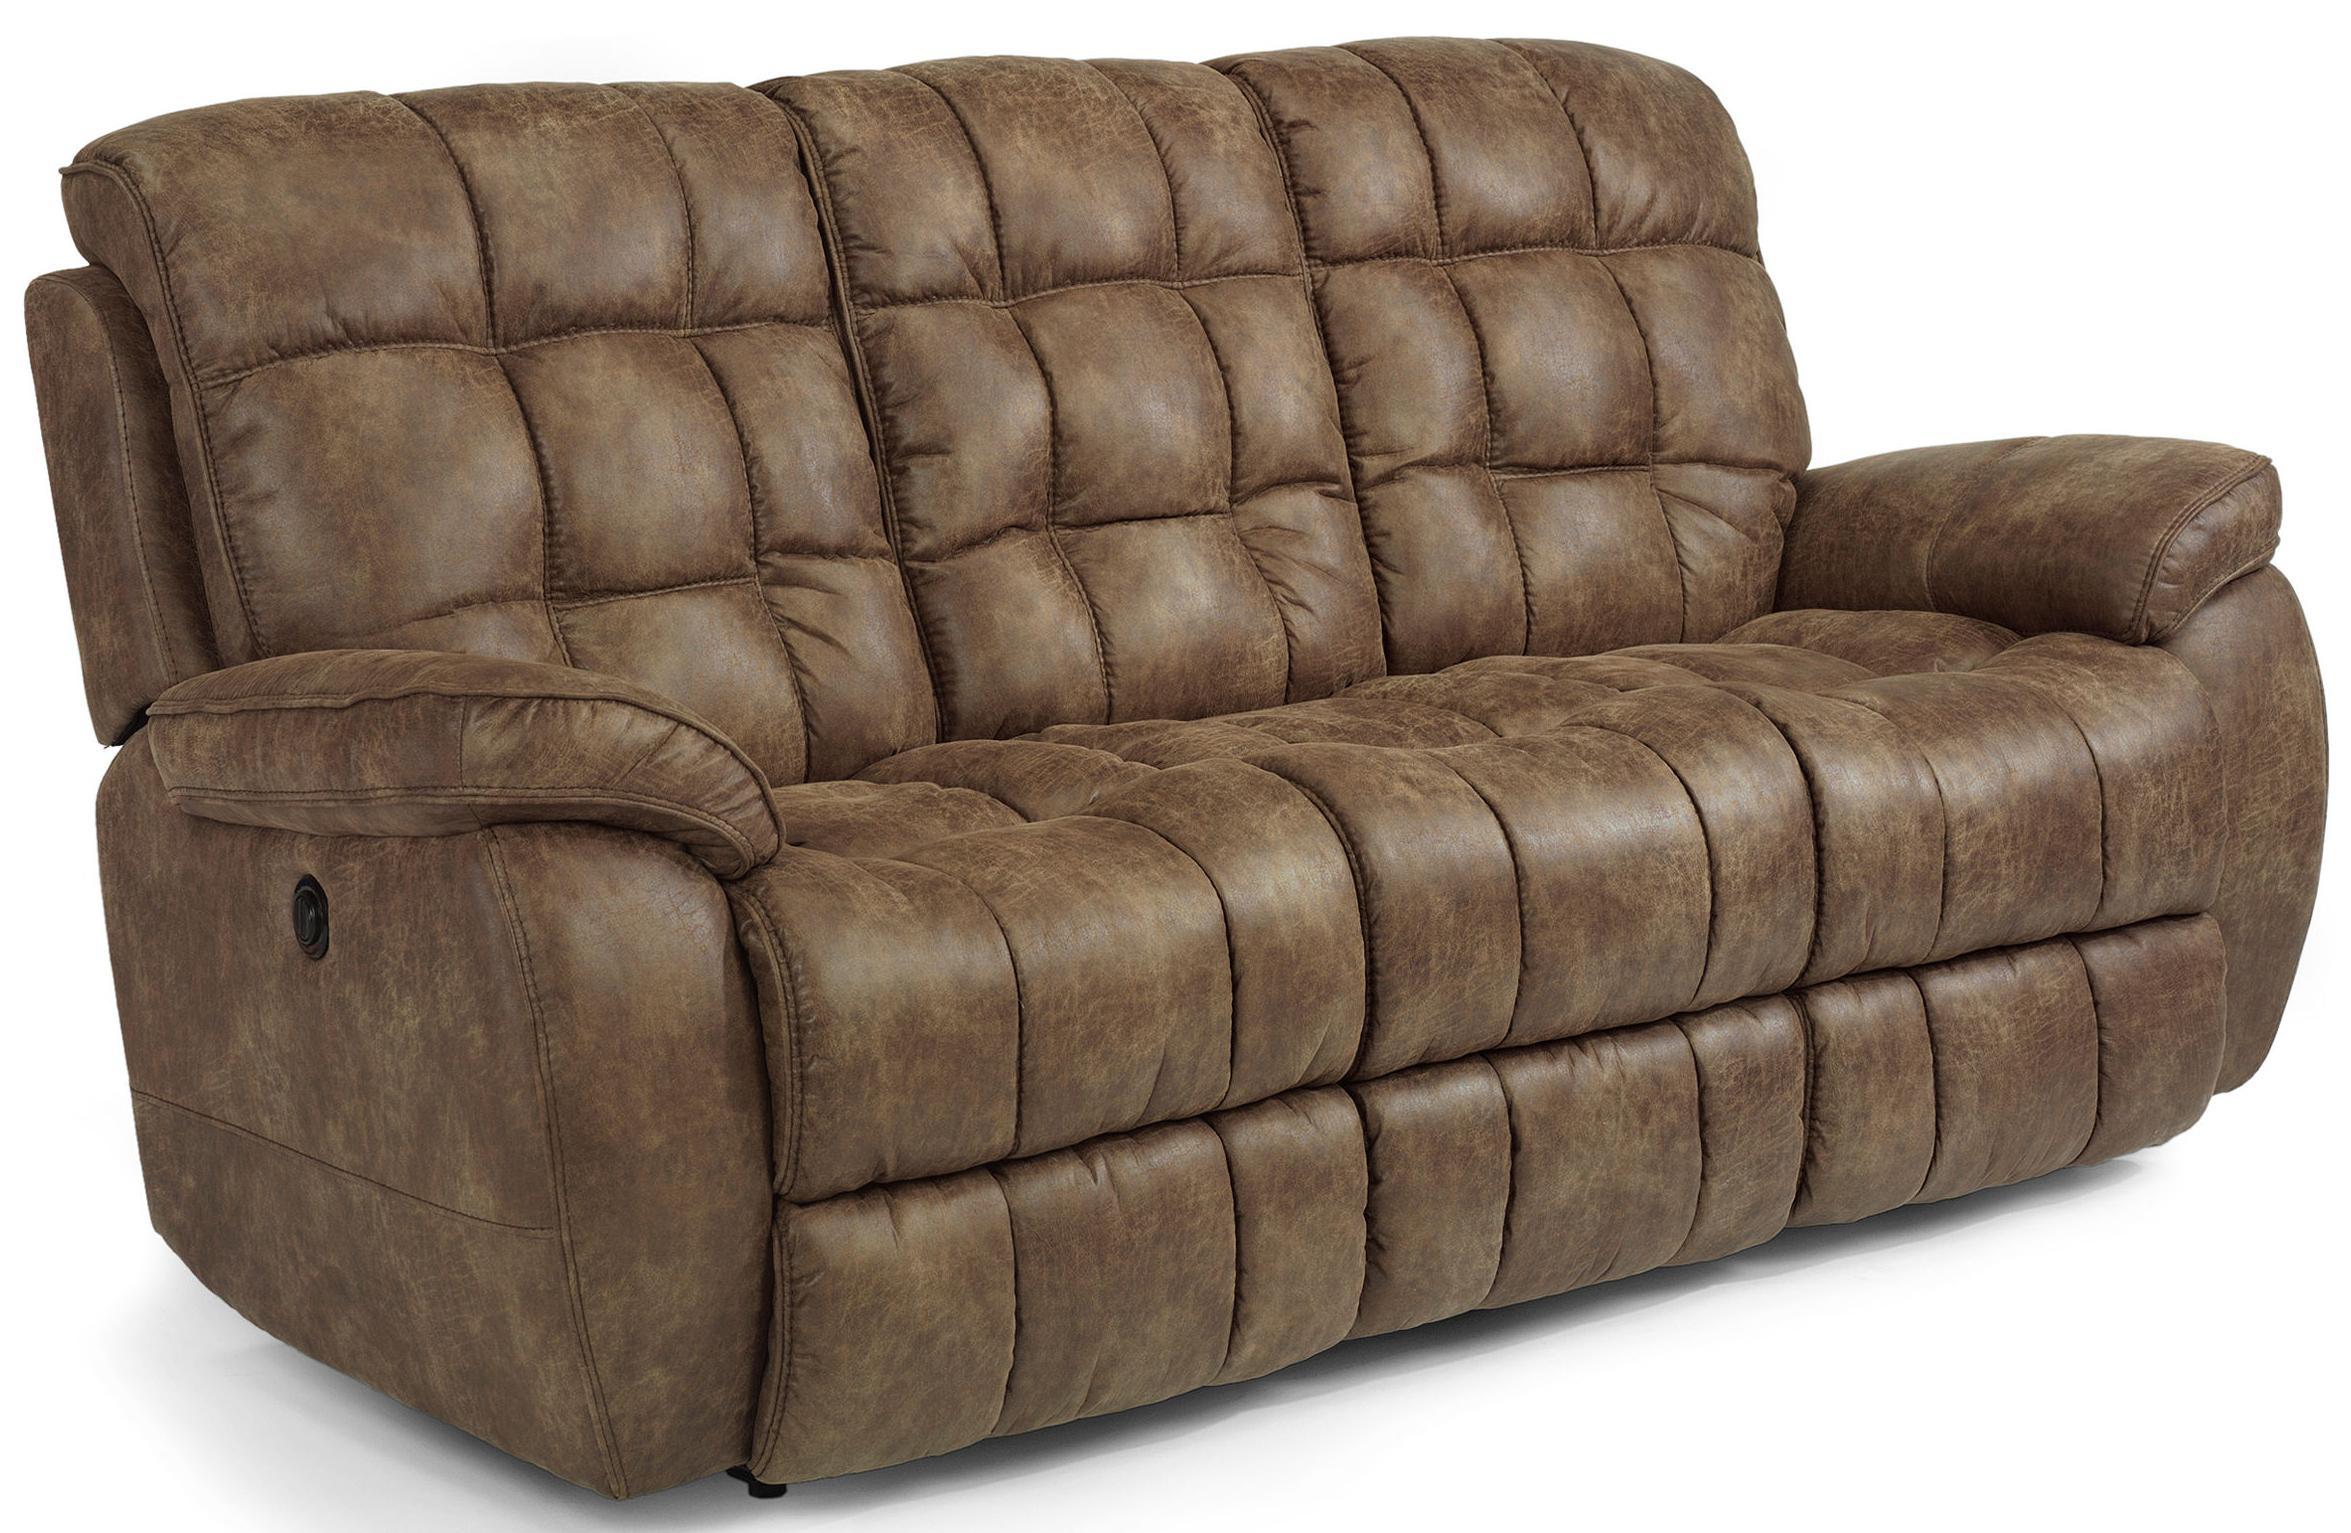 Flexsteel Latitudes - Nashua Power Reclining Sofa - Item Number: 1449-62P-325-72